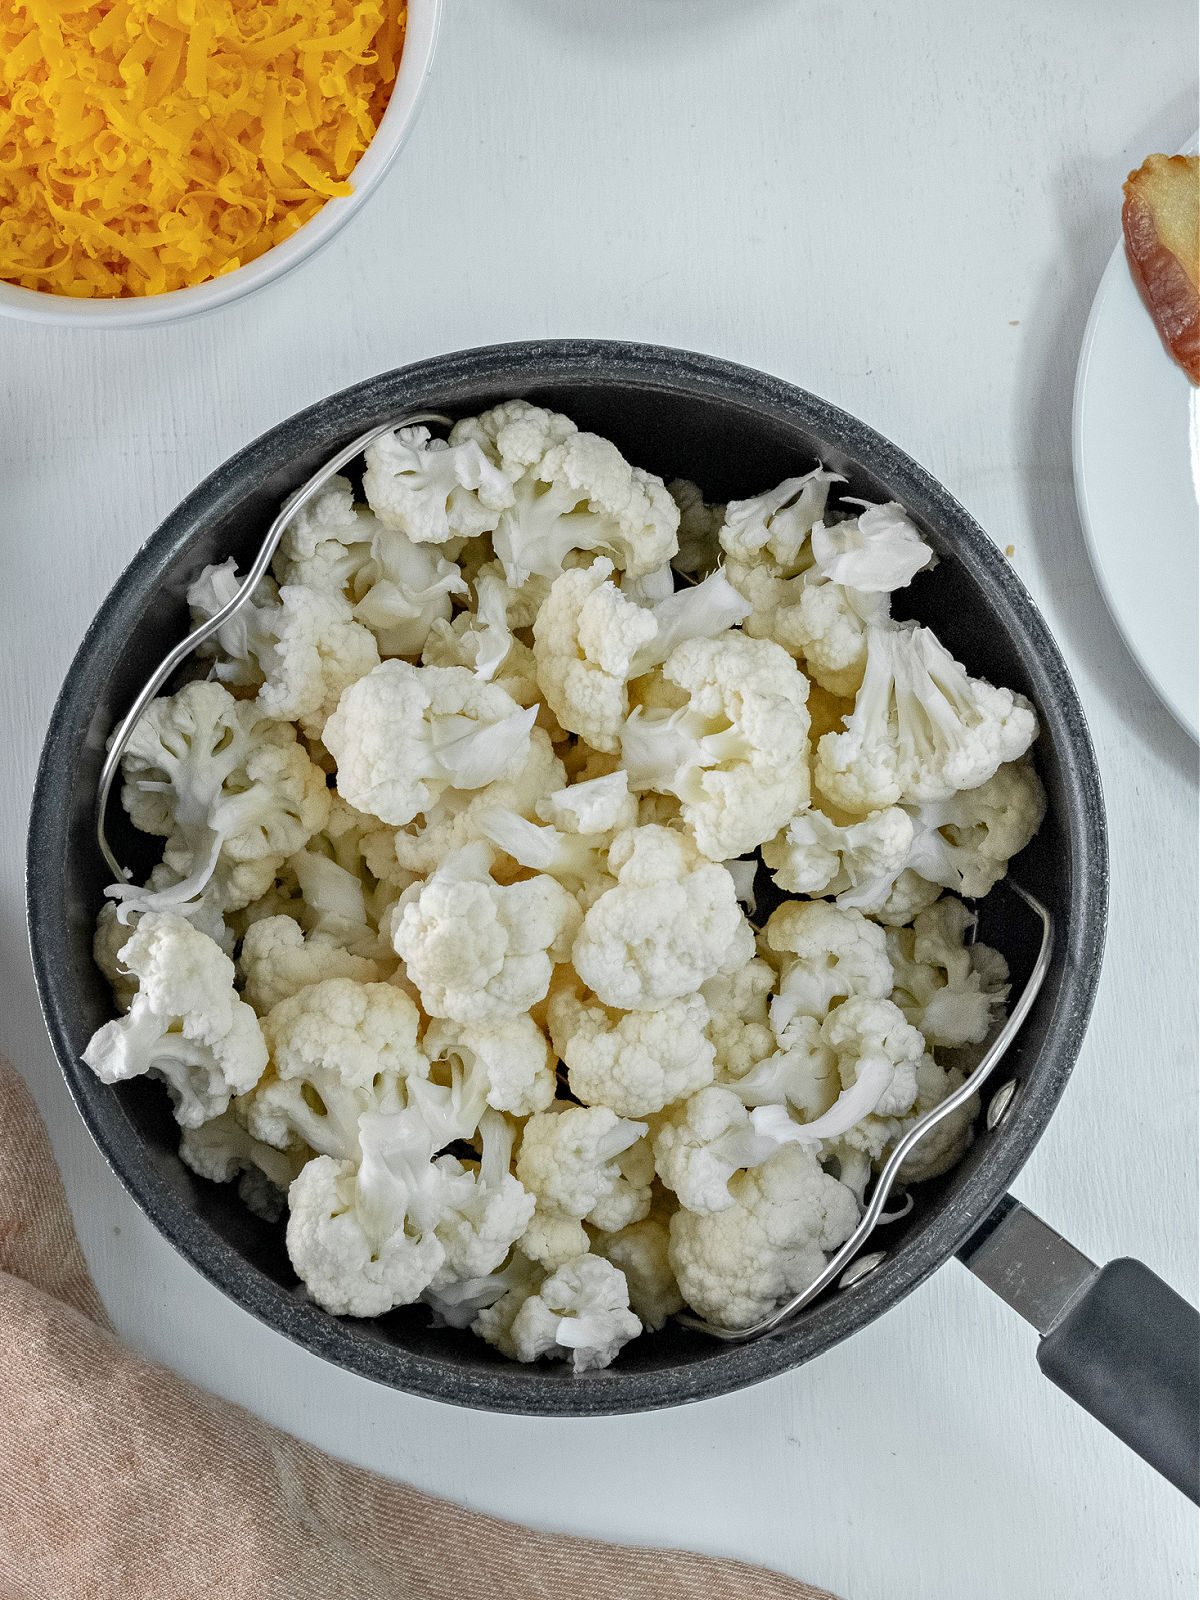 Pot filled with cauliflower florets.